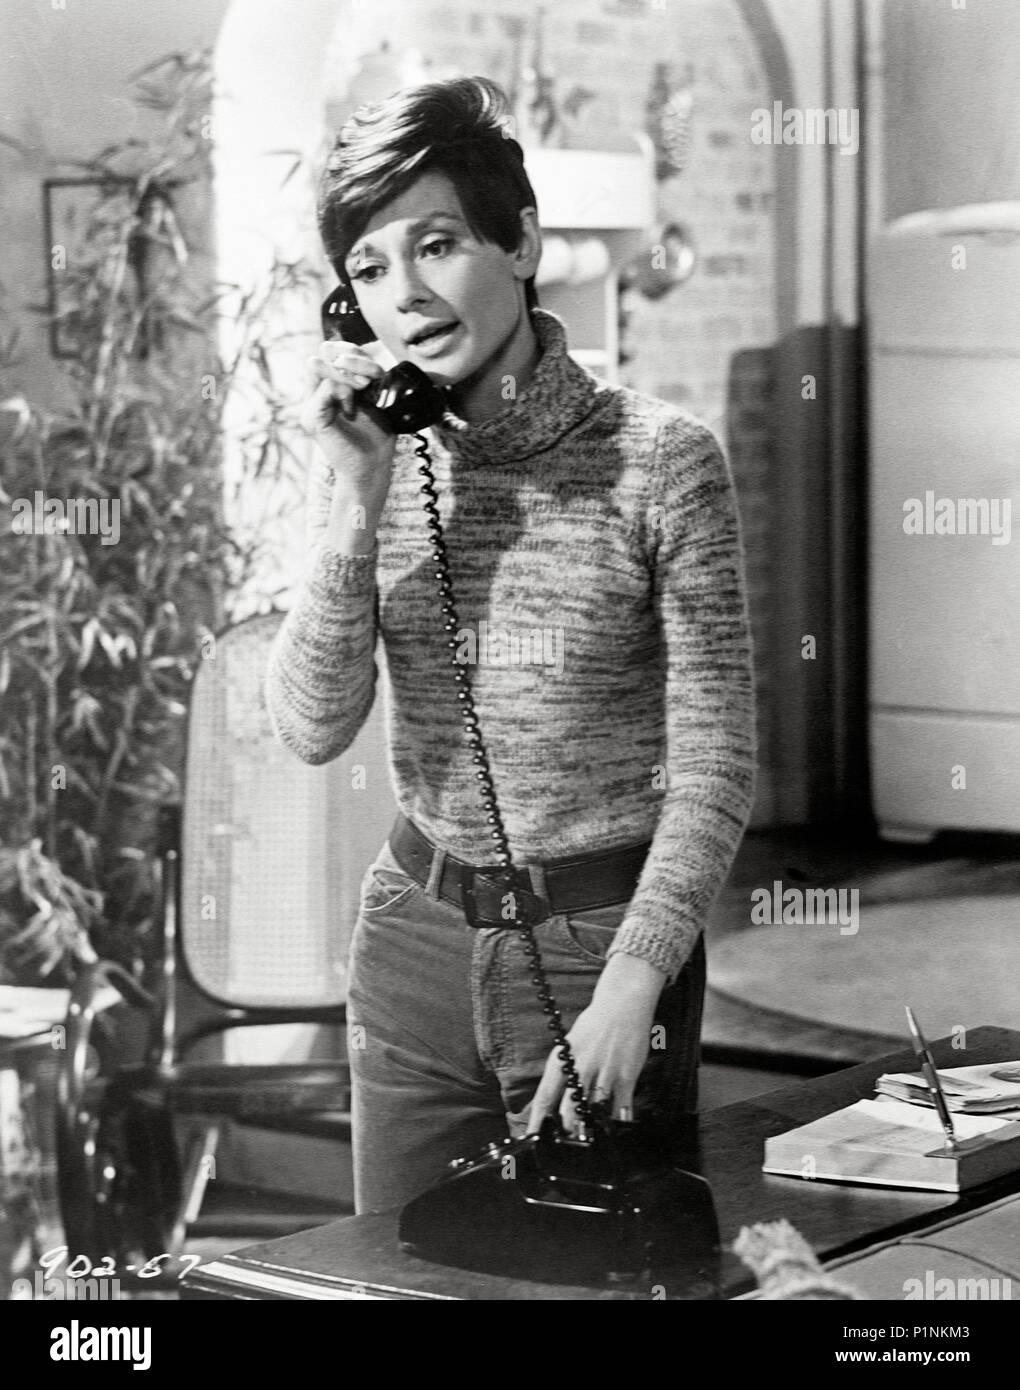 Original Film Title: WAIT UNTIL DARK.  English Title: WAIT UNTIL DARK.  Film Director: TERENCE YOUNG.  Year: 1967.  Stars: AUDREY HEPBURN. Credit: WARNER BROTHERS / Album - Stock Image